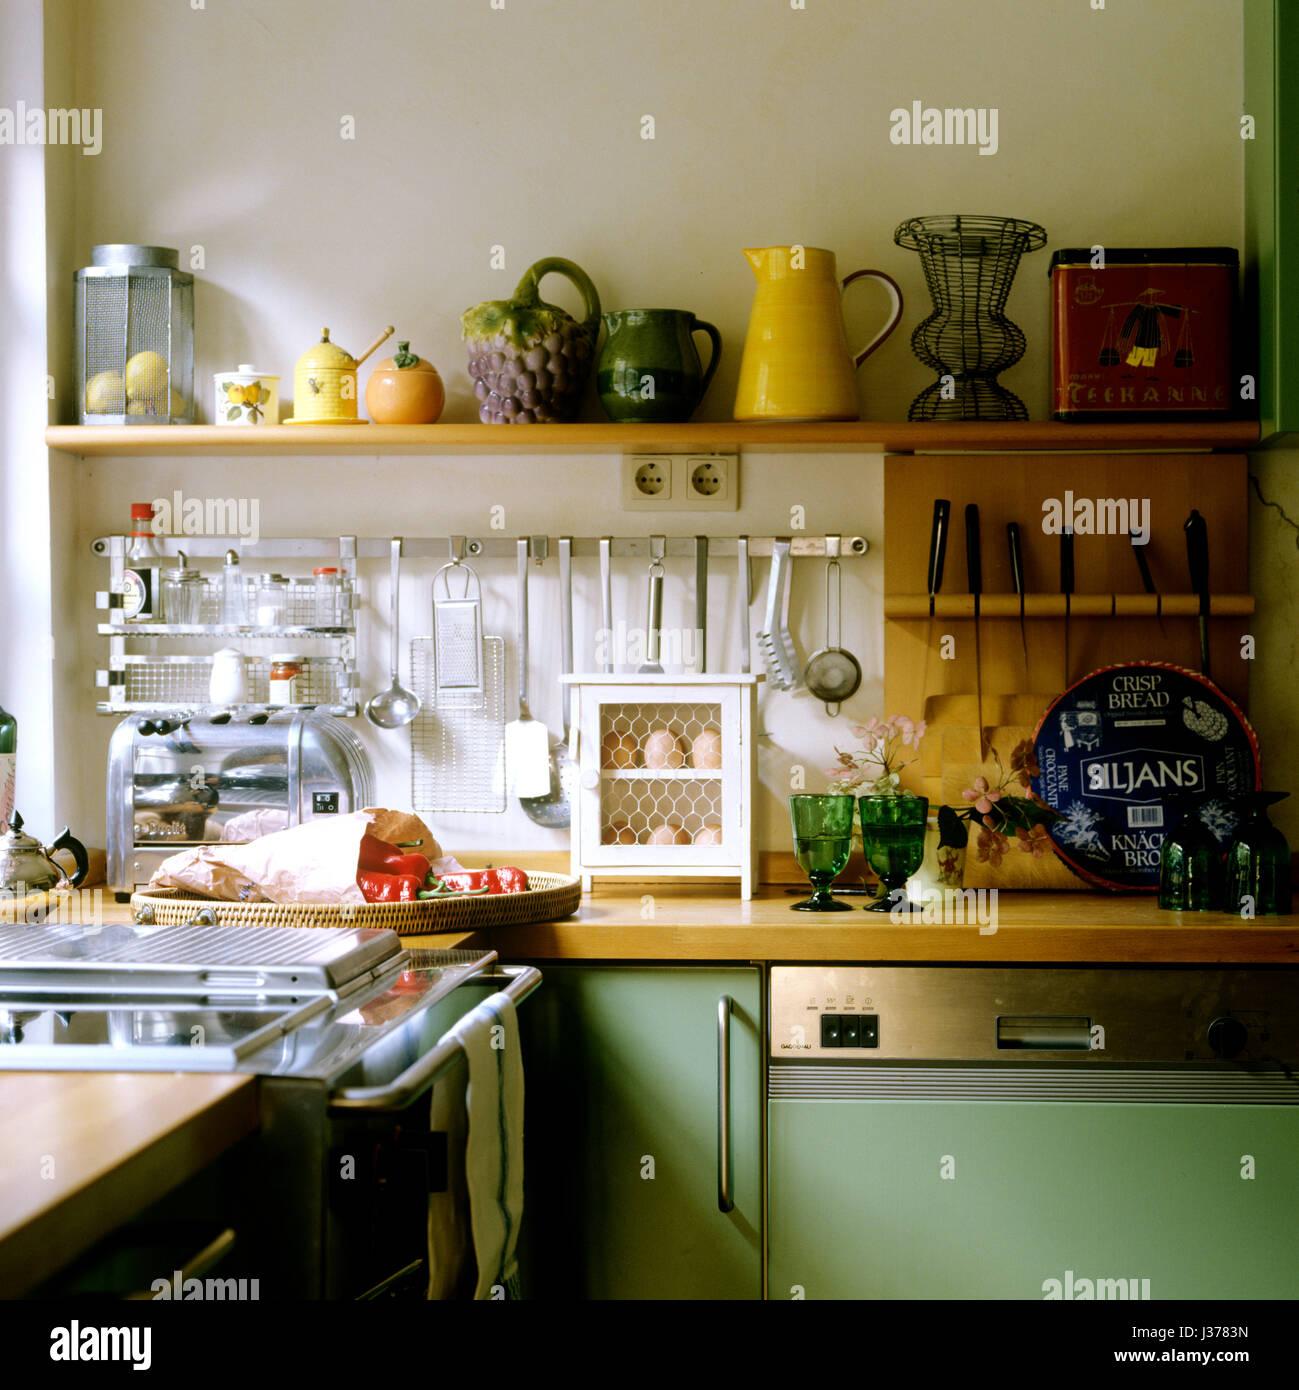 Kitchen Cabinet Vancouver Glassware Display Kitchen Stock Photos Amp Glassware Display